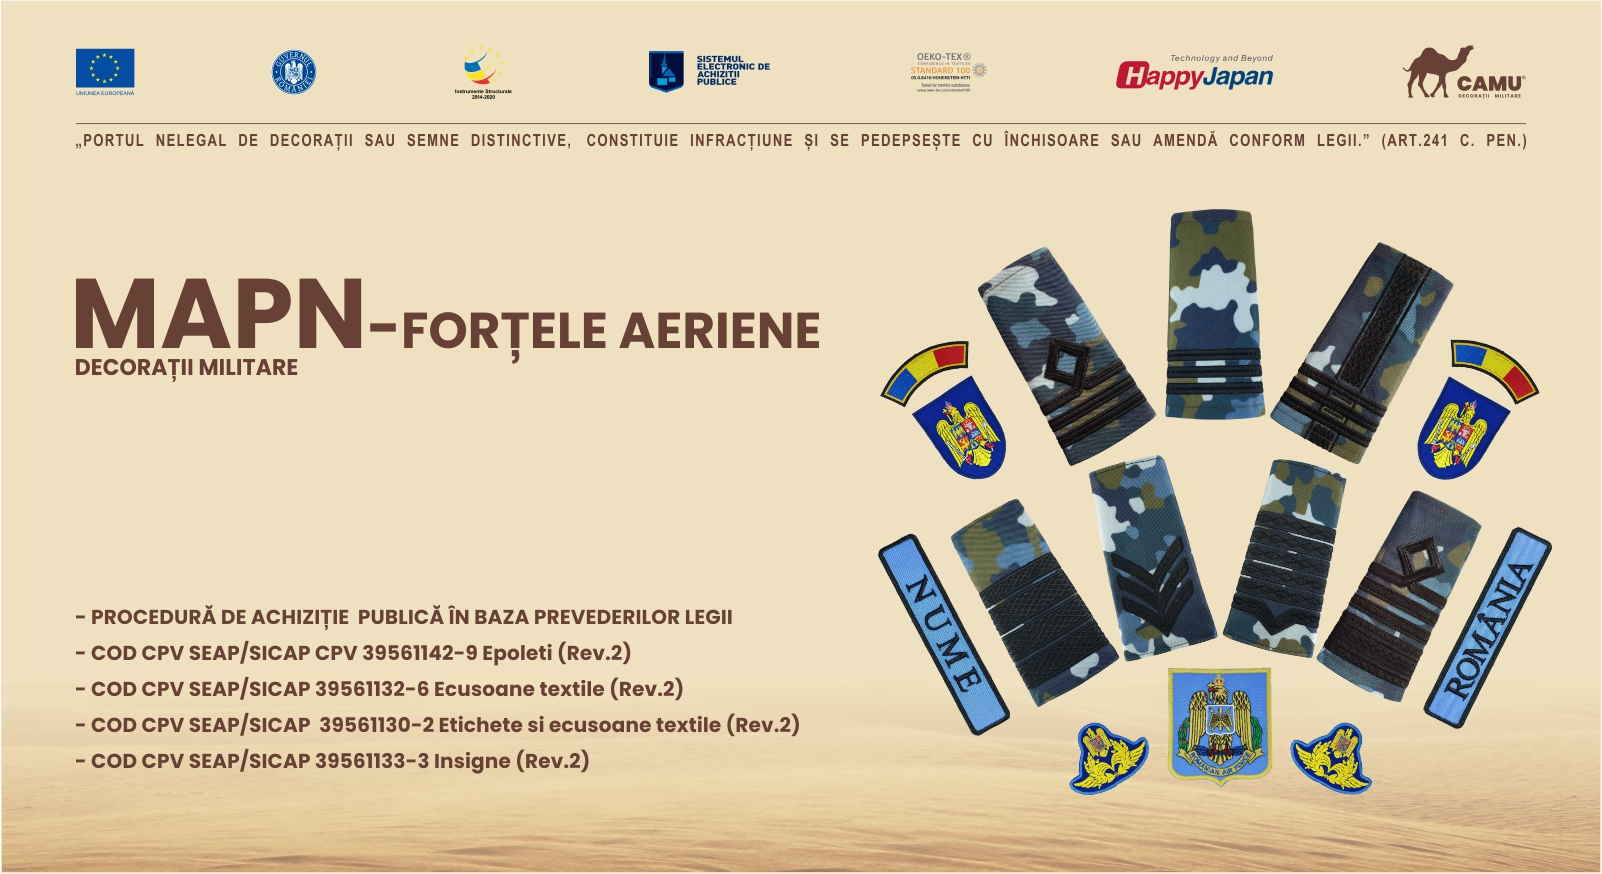 Aviatie GRADE MILITARE AVIATIE FORTELE AERIENE - MAGAZIN - Ierarhie Grade Militare Armata MApN Combat